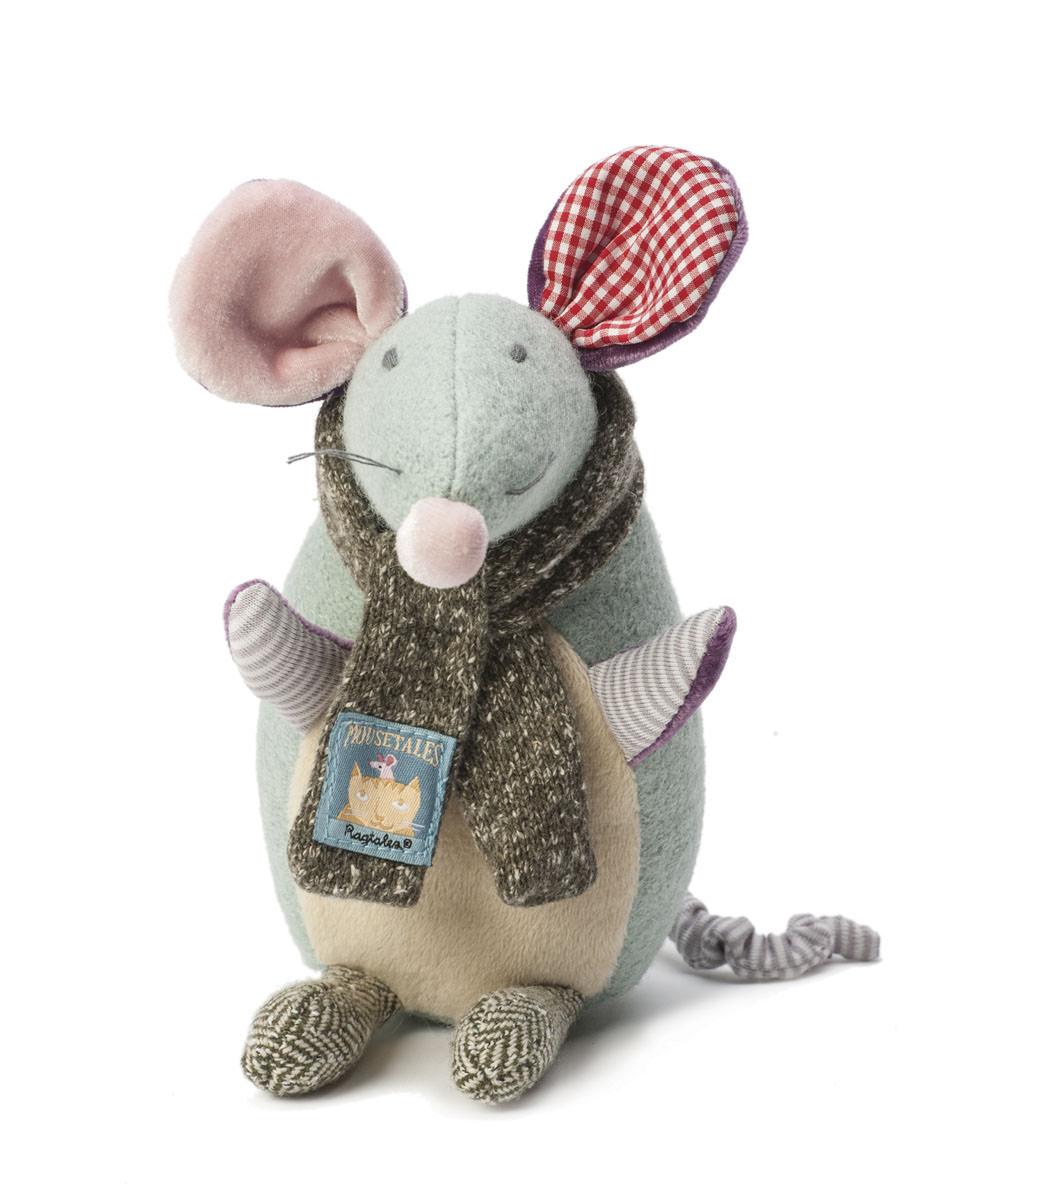 Tweedie | Mouse Soft Toy from Ragtales Ltd